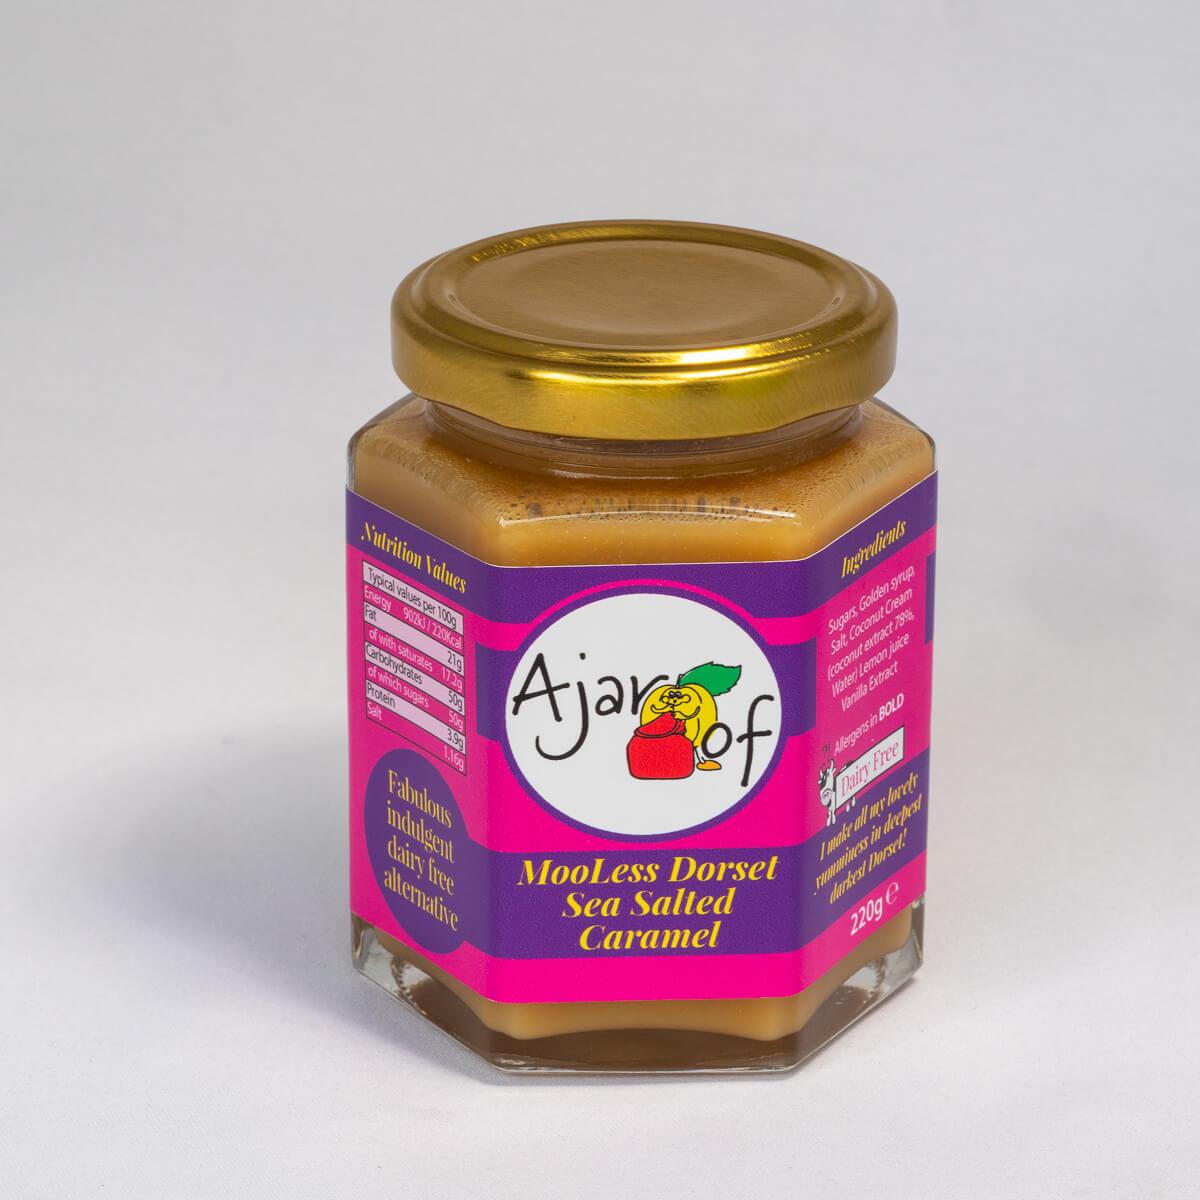 mooless-dorset-sea-salted-caramel